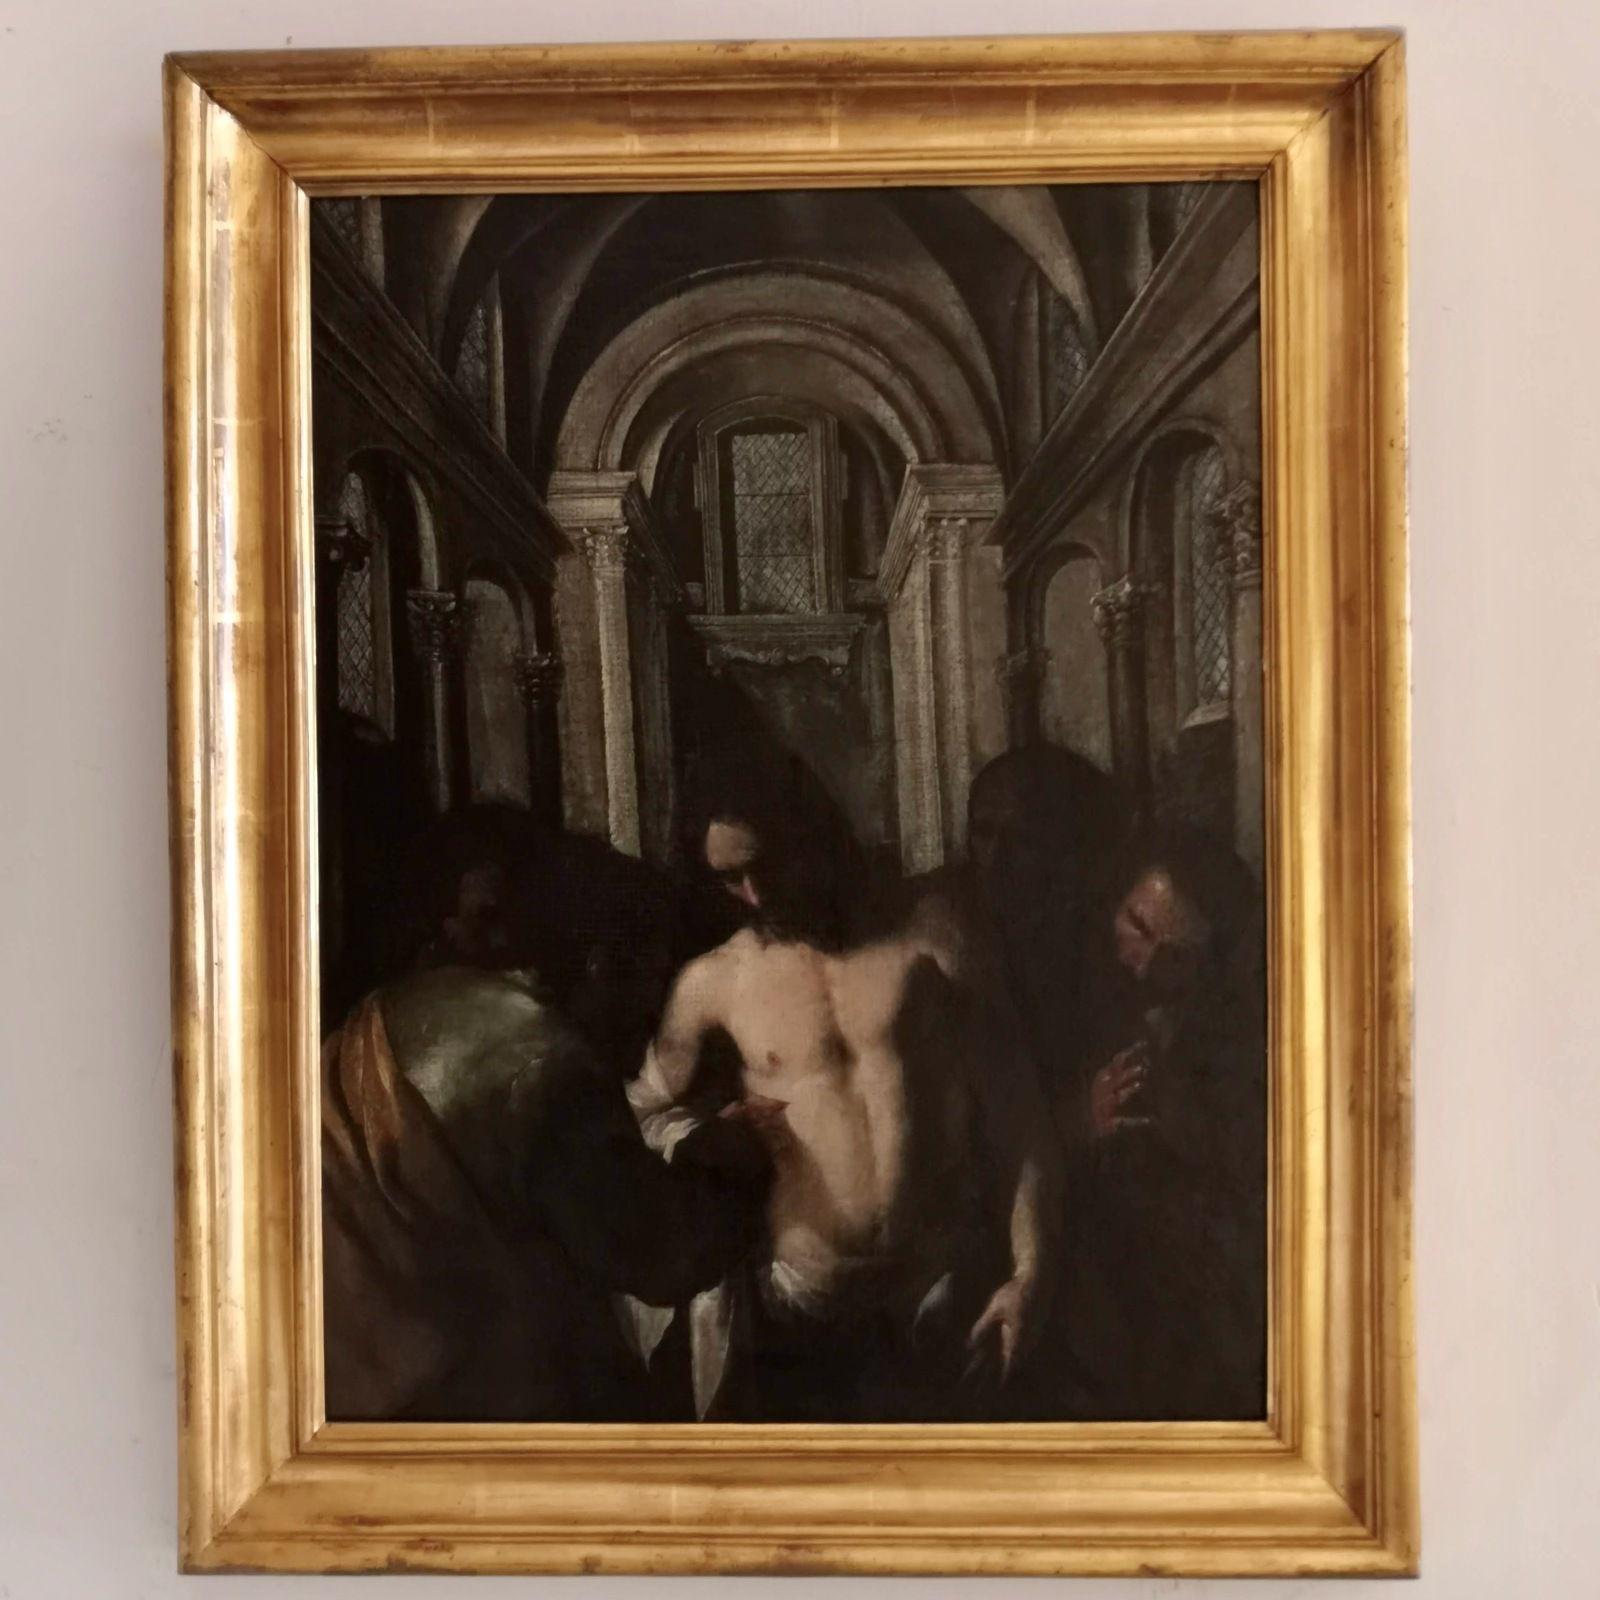 Cavallino (Bernardo) (1616-1656), Incredulità di San Tommasso